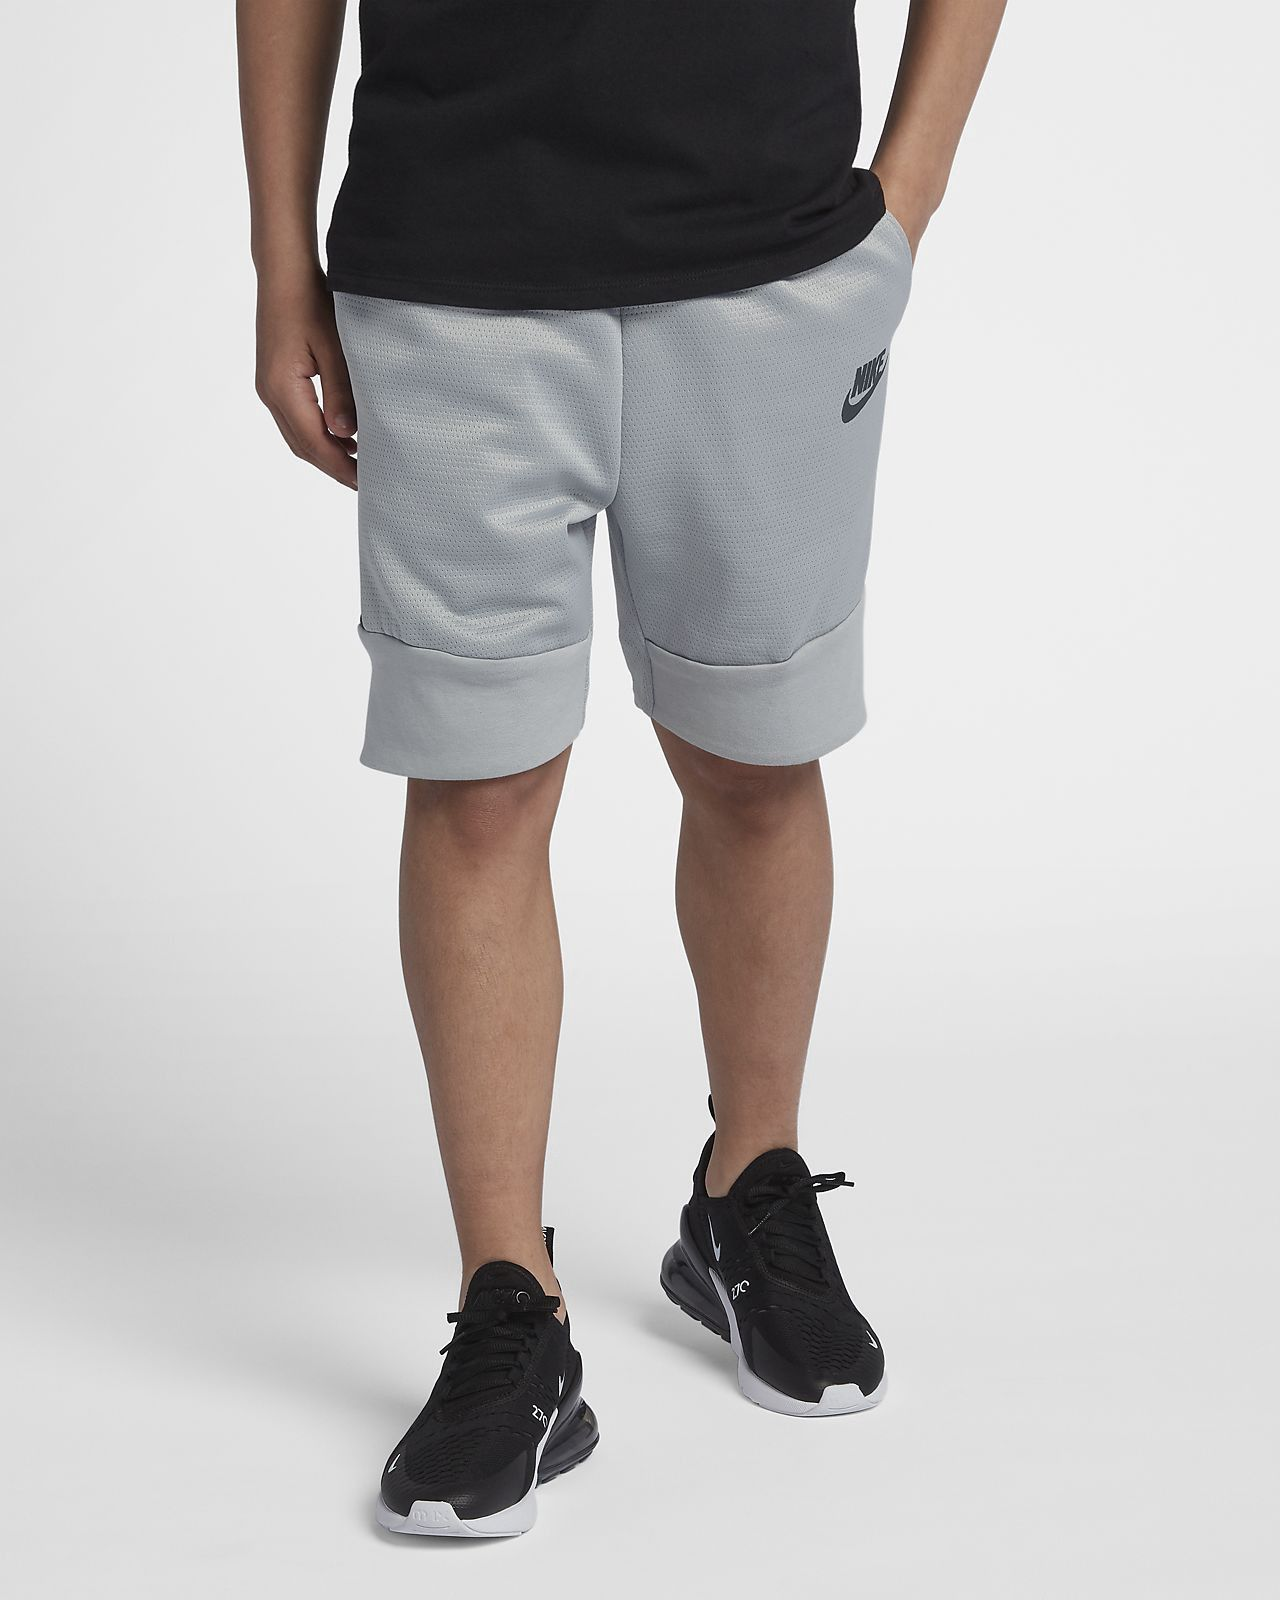 affb9d7222a Nike Sportswear Tech Fleece Big Kids' (Boys') Shorts - M (10-12 ...